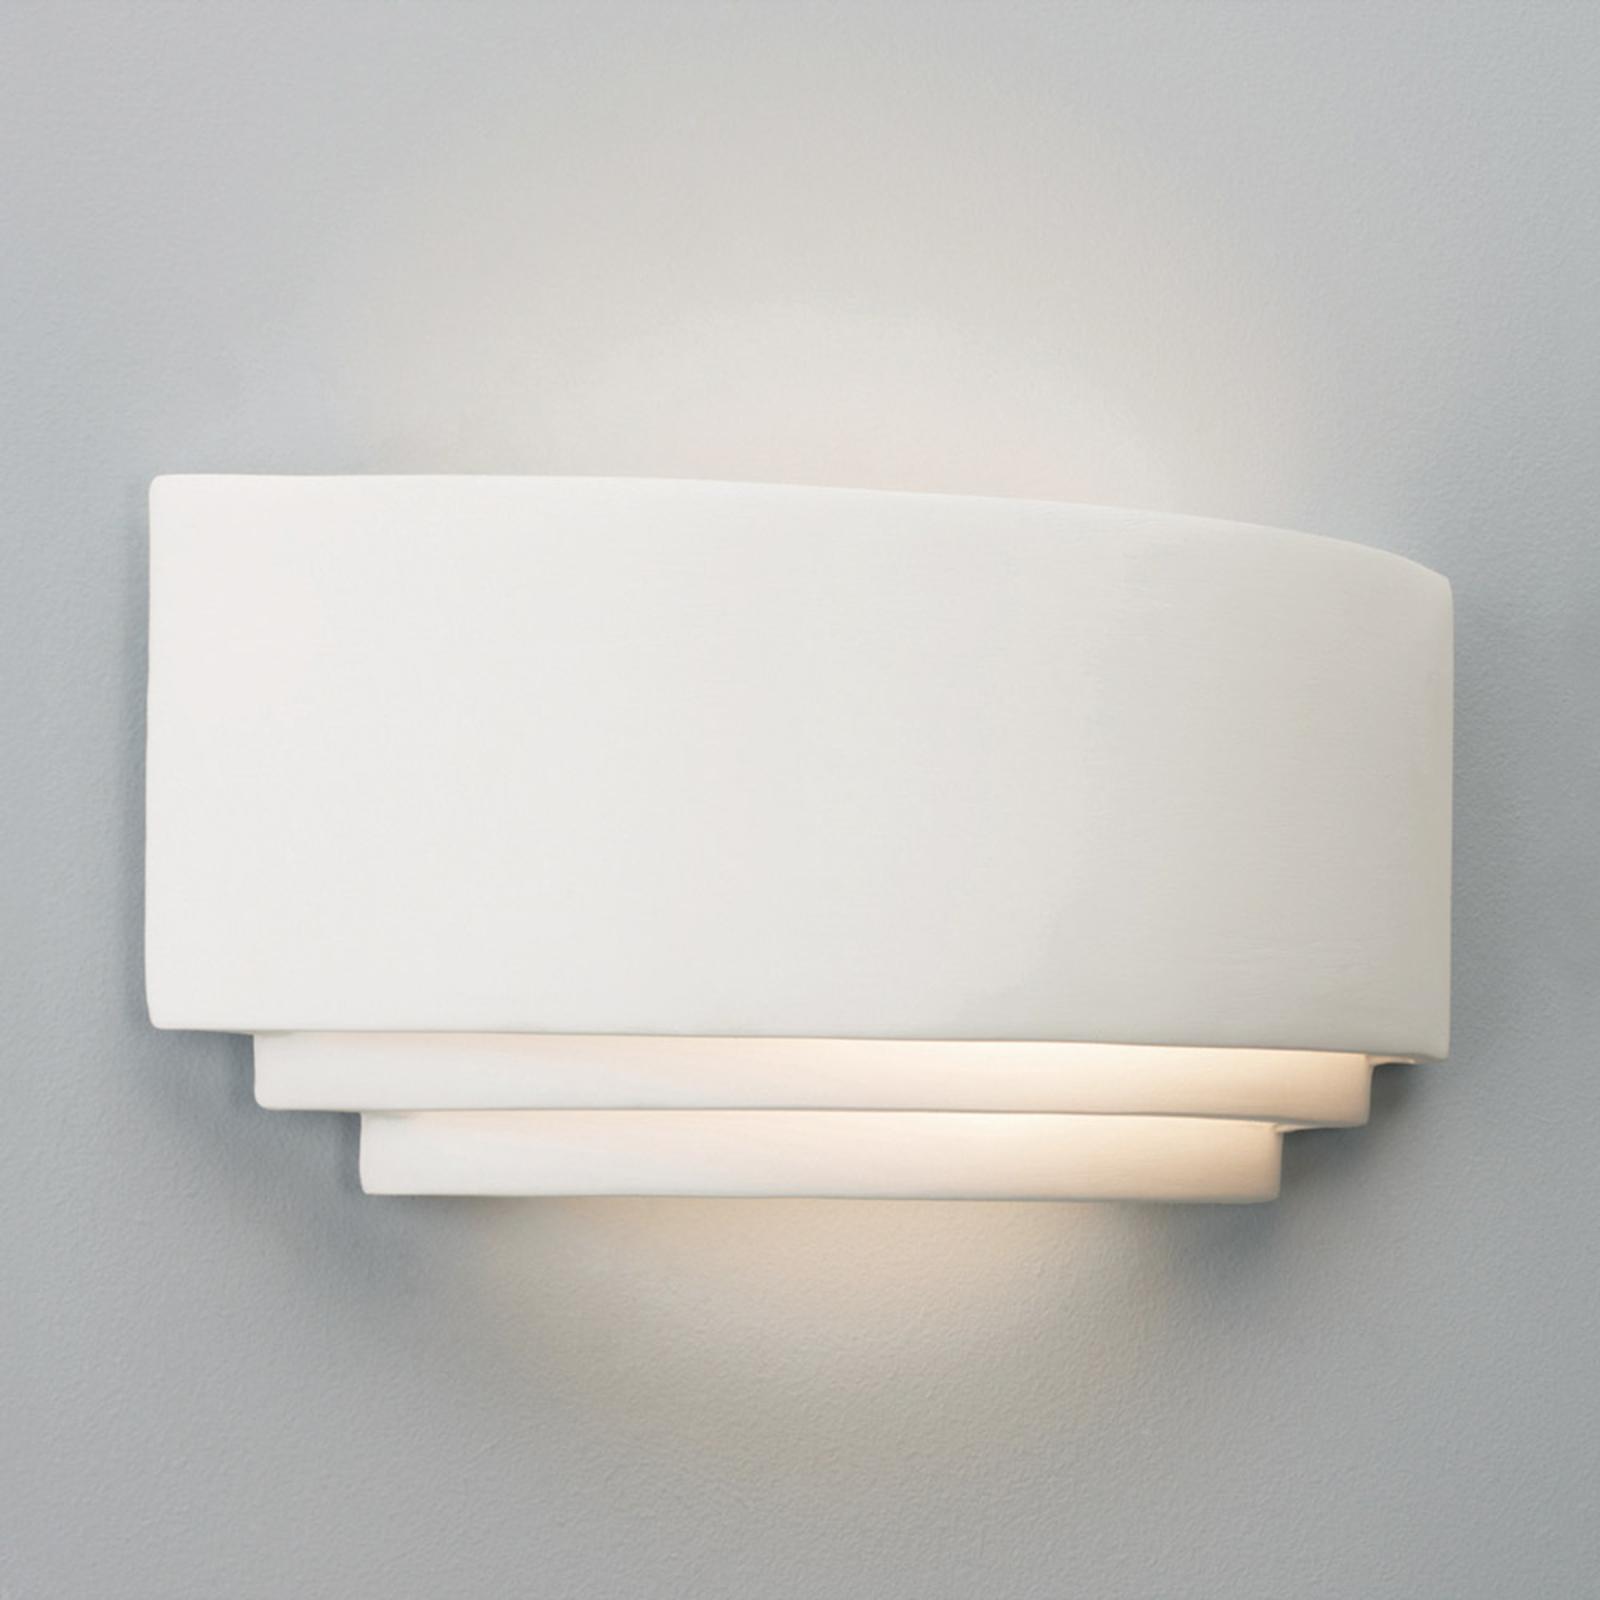 Astro Amalfi 315 – biele sadrové svetlo 31,5cm_1020229_1